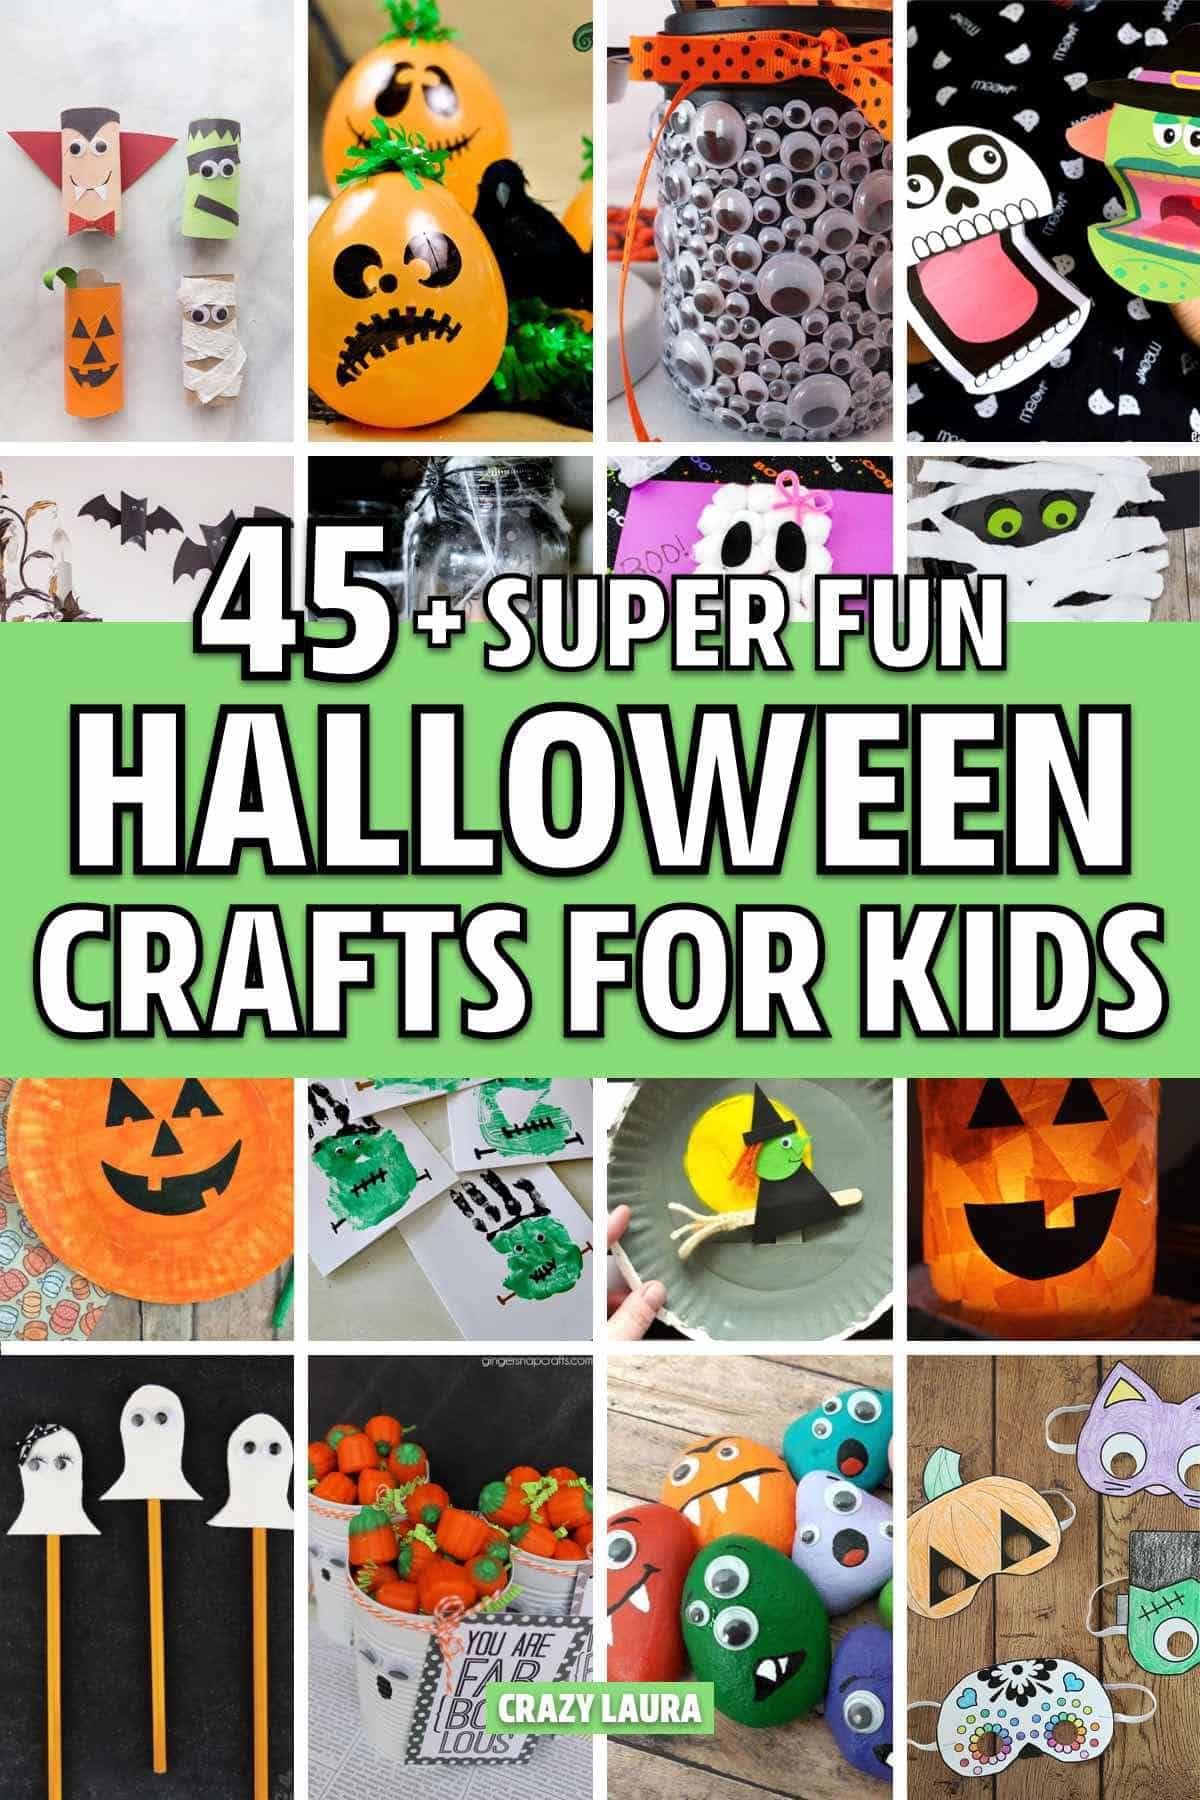 Halloween Craft Ideas 2020 45+ Best Halloween Crafts For Kids In 2020   Crazy Laura